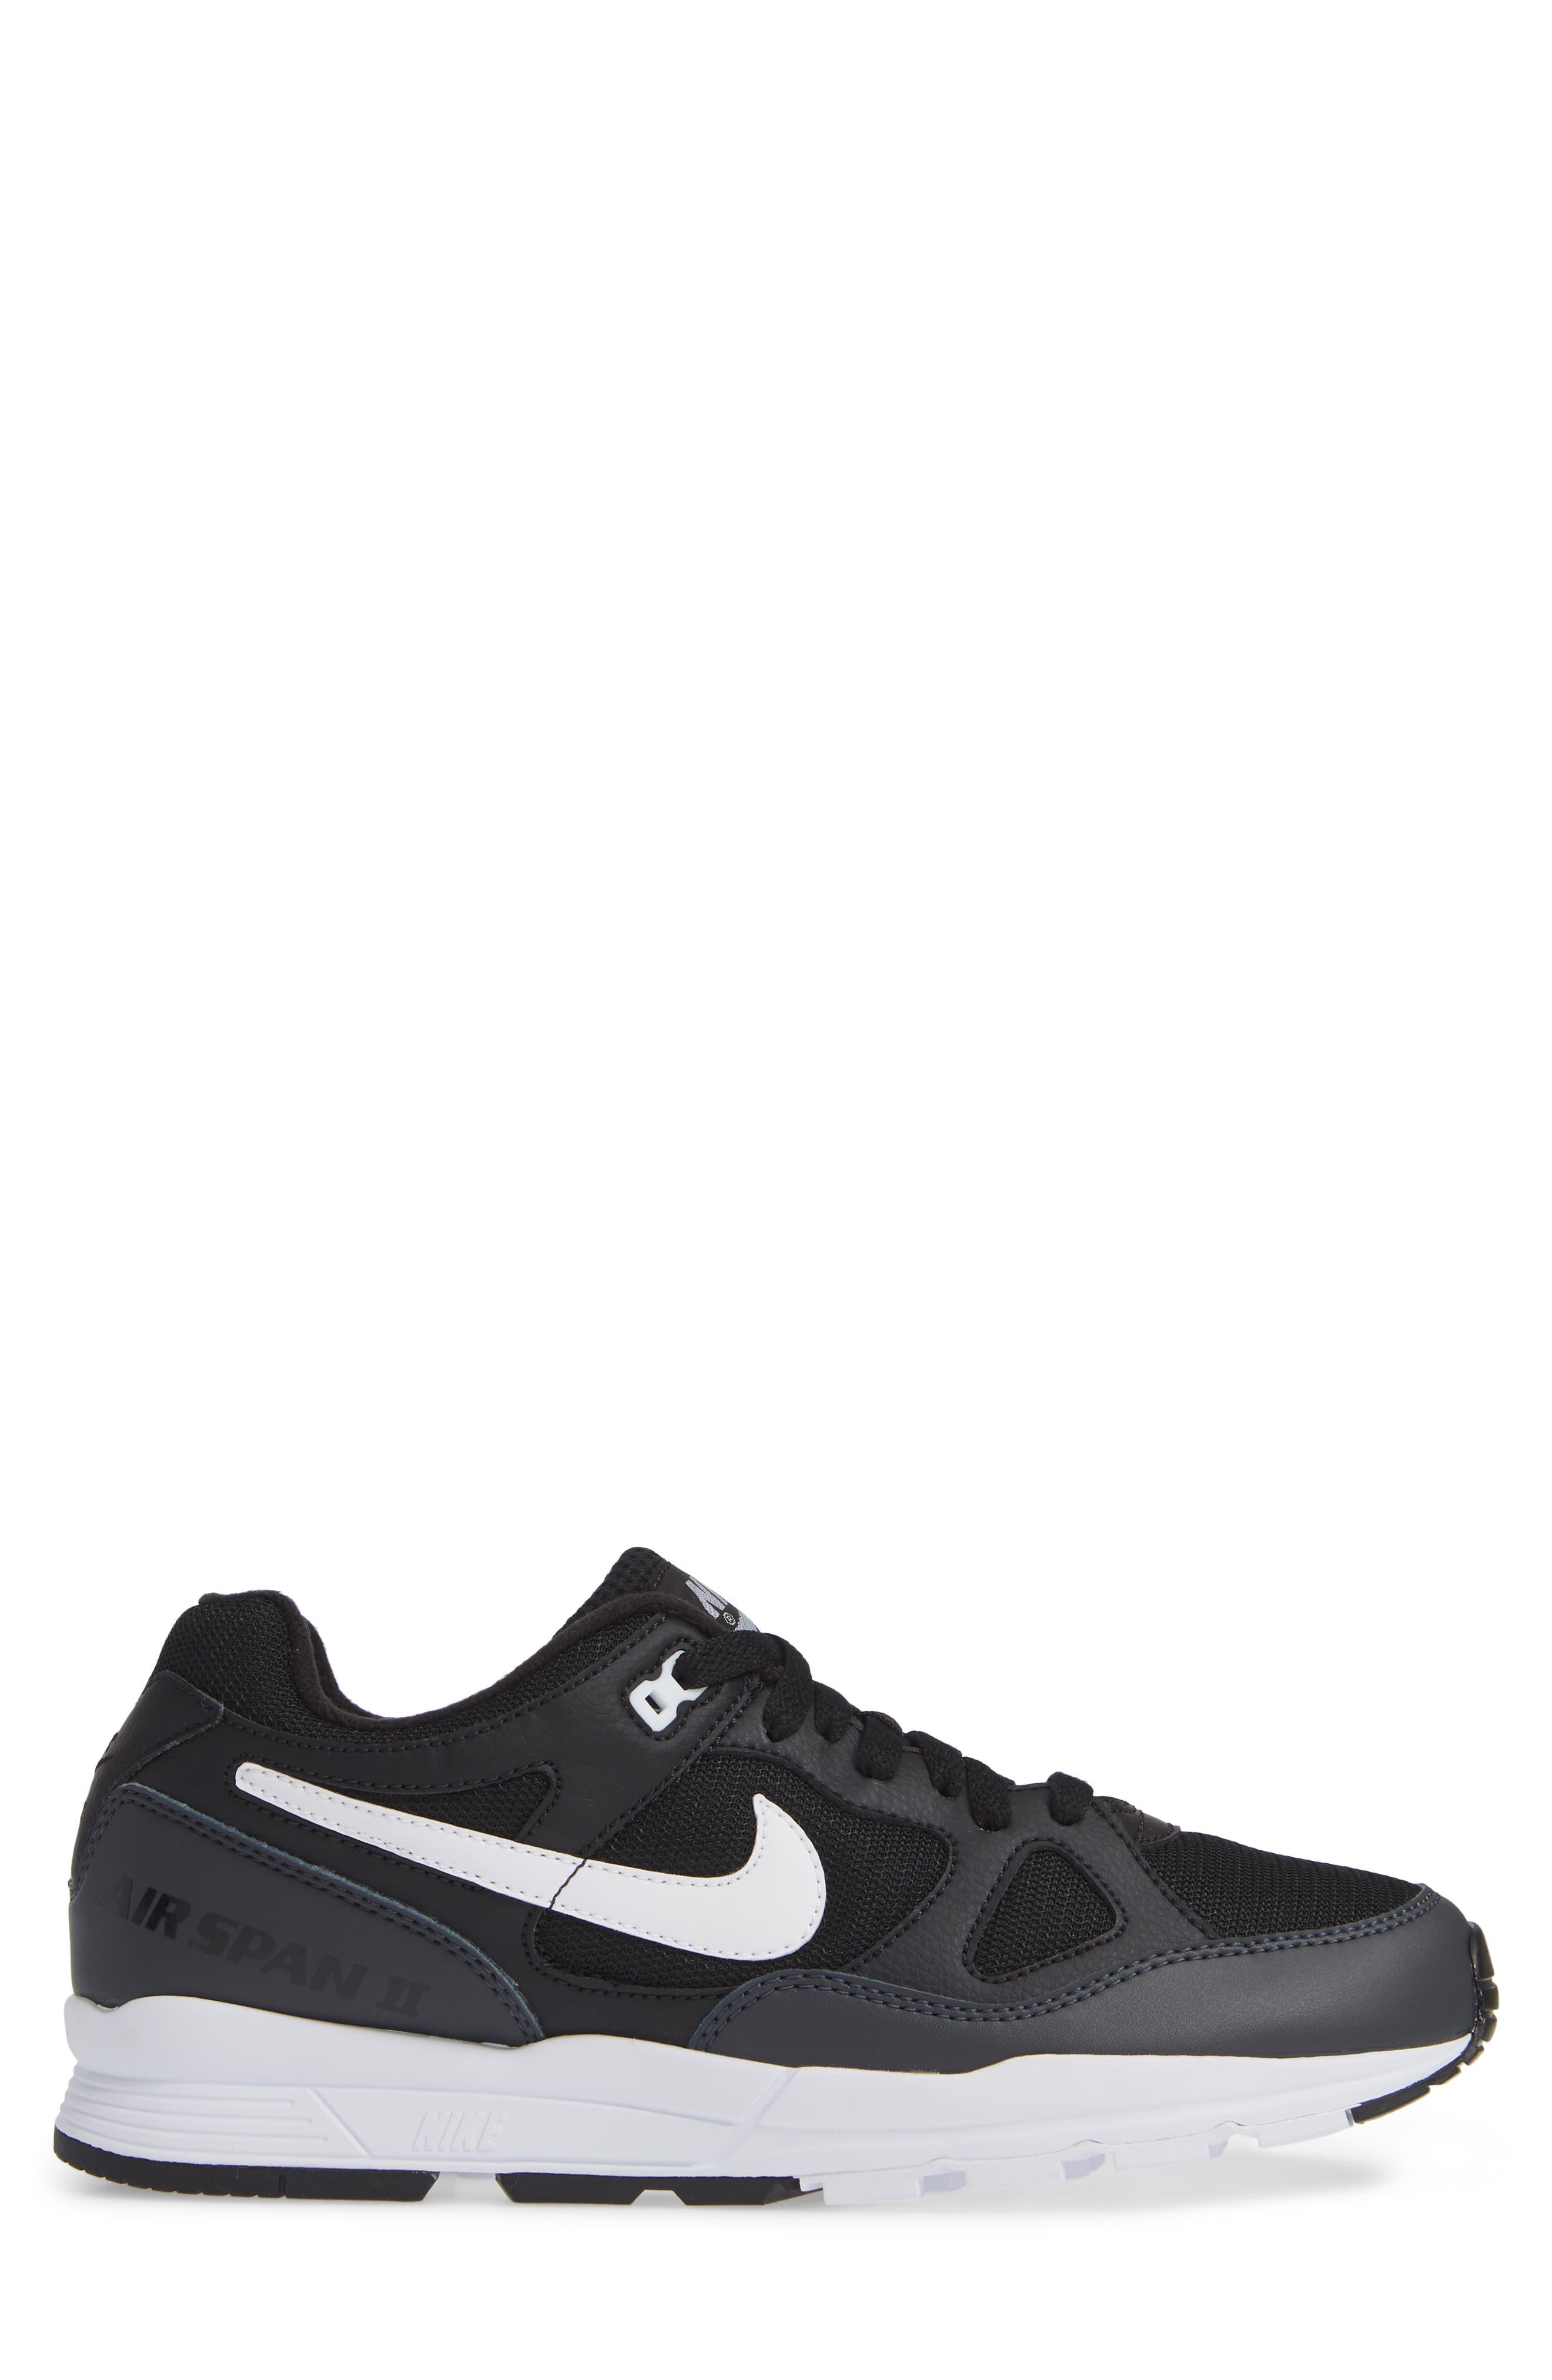 Air Span II Sneaker,                             Alternate thumbnail 3, color,                             BLACK/ WHITE/ ANTHRACITE